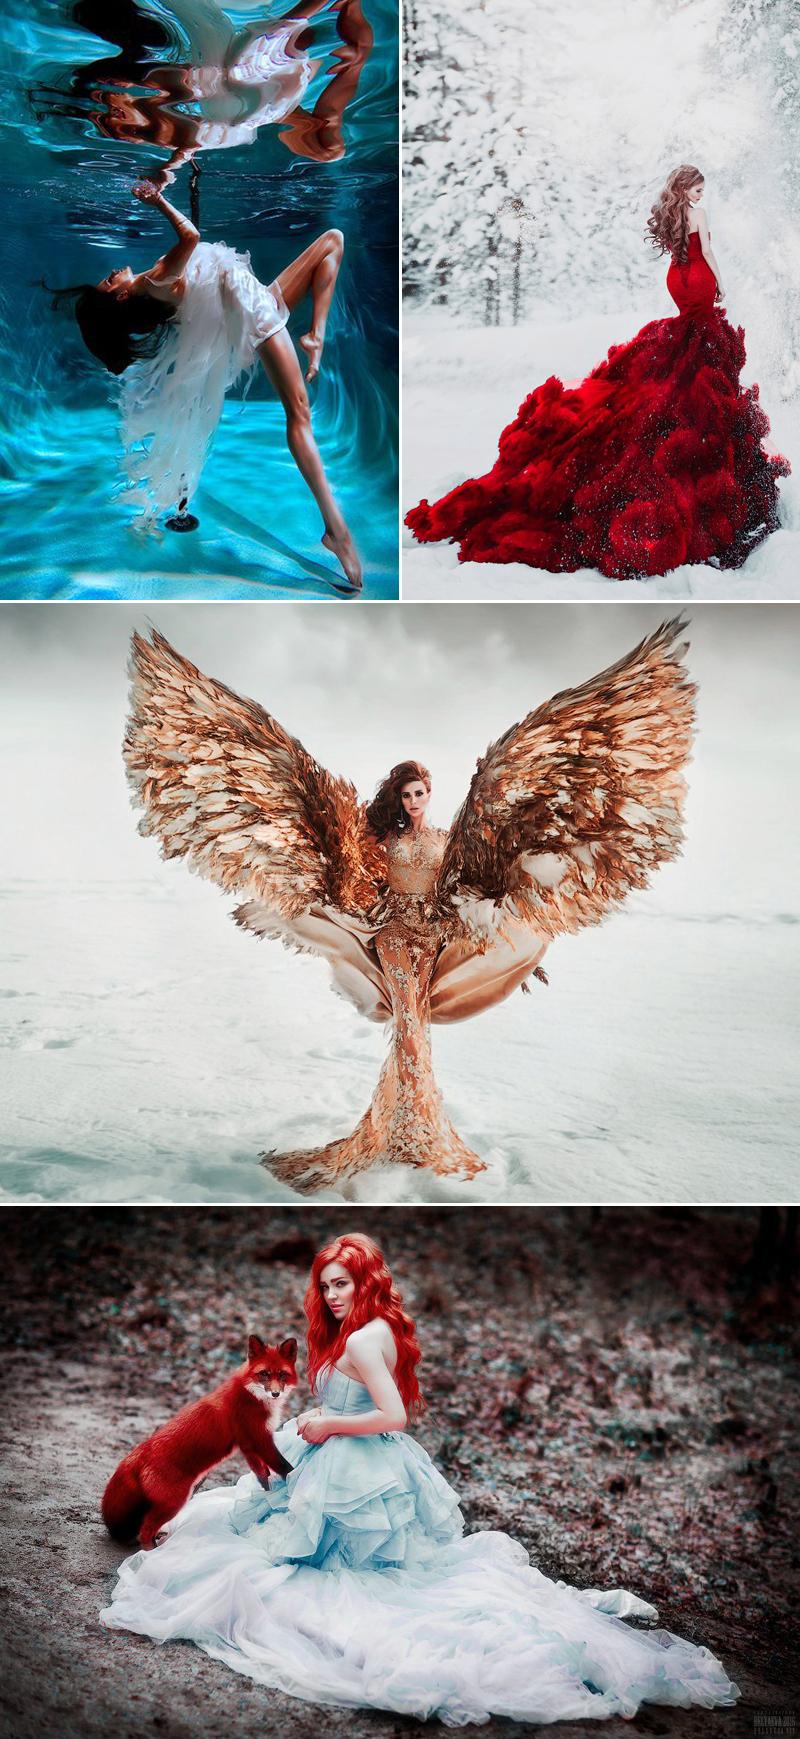 fantasy05-Svetlana-Belyaeva